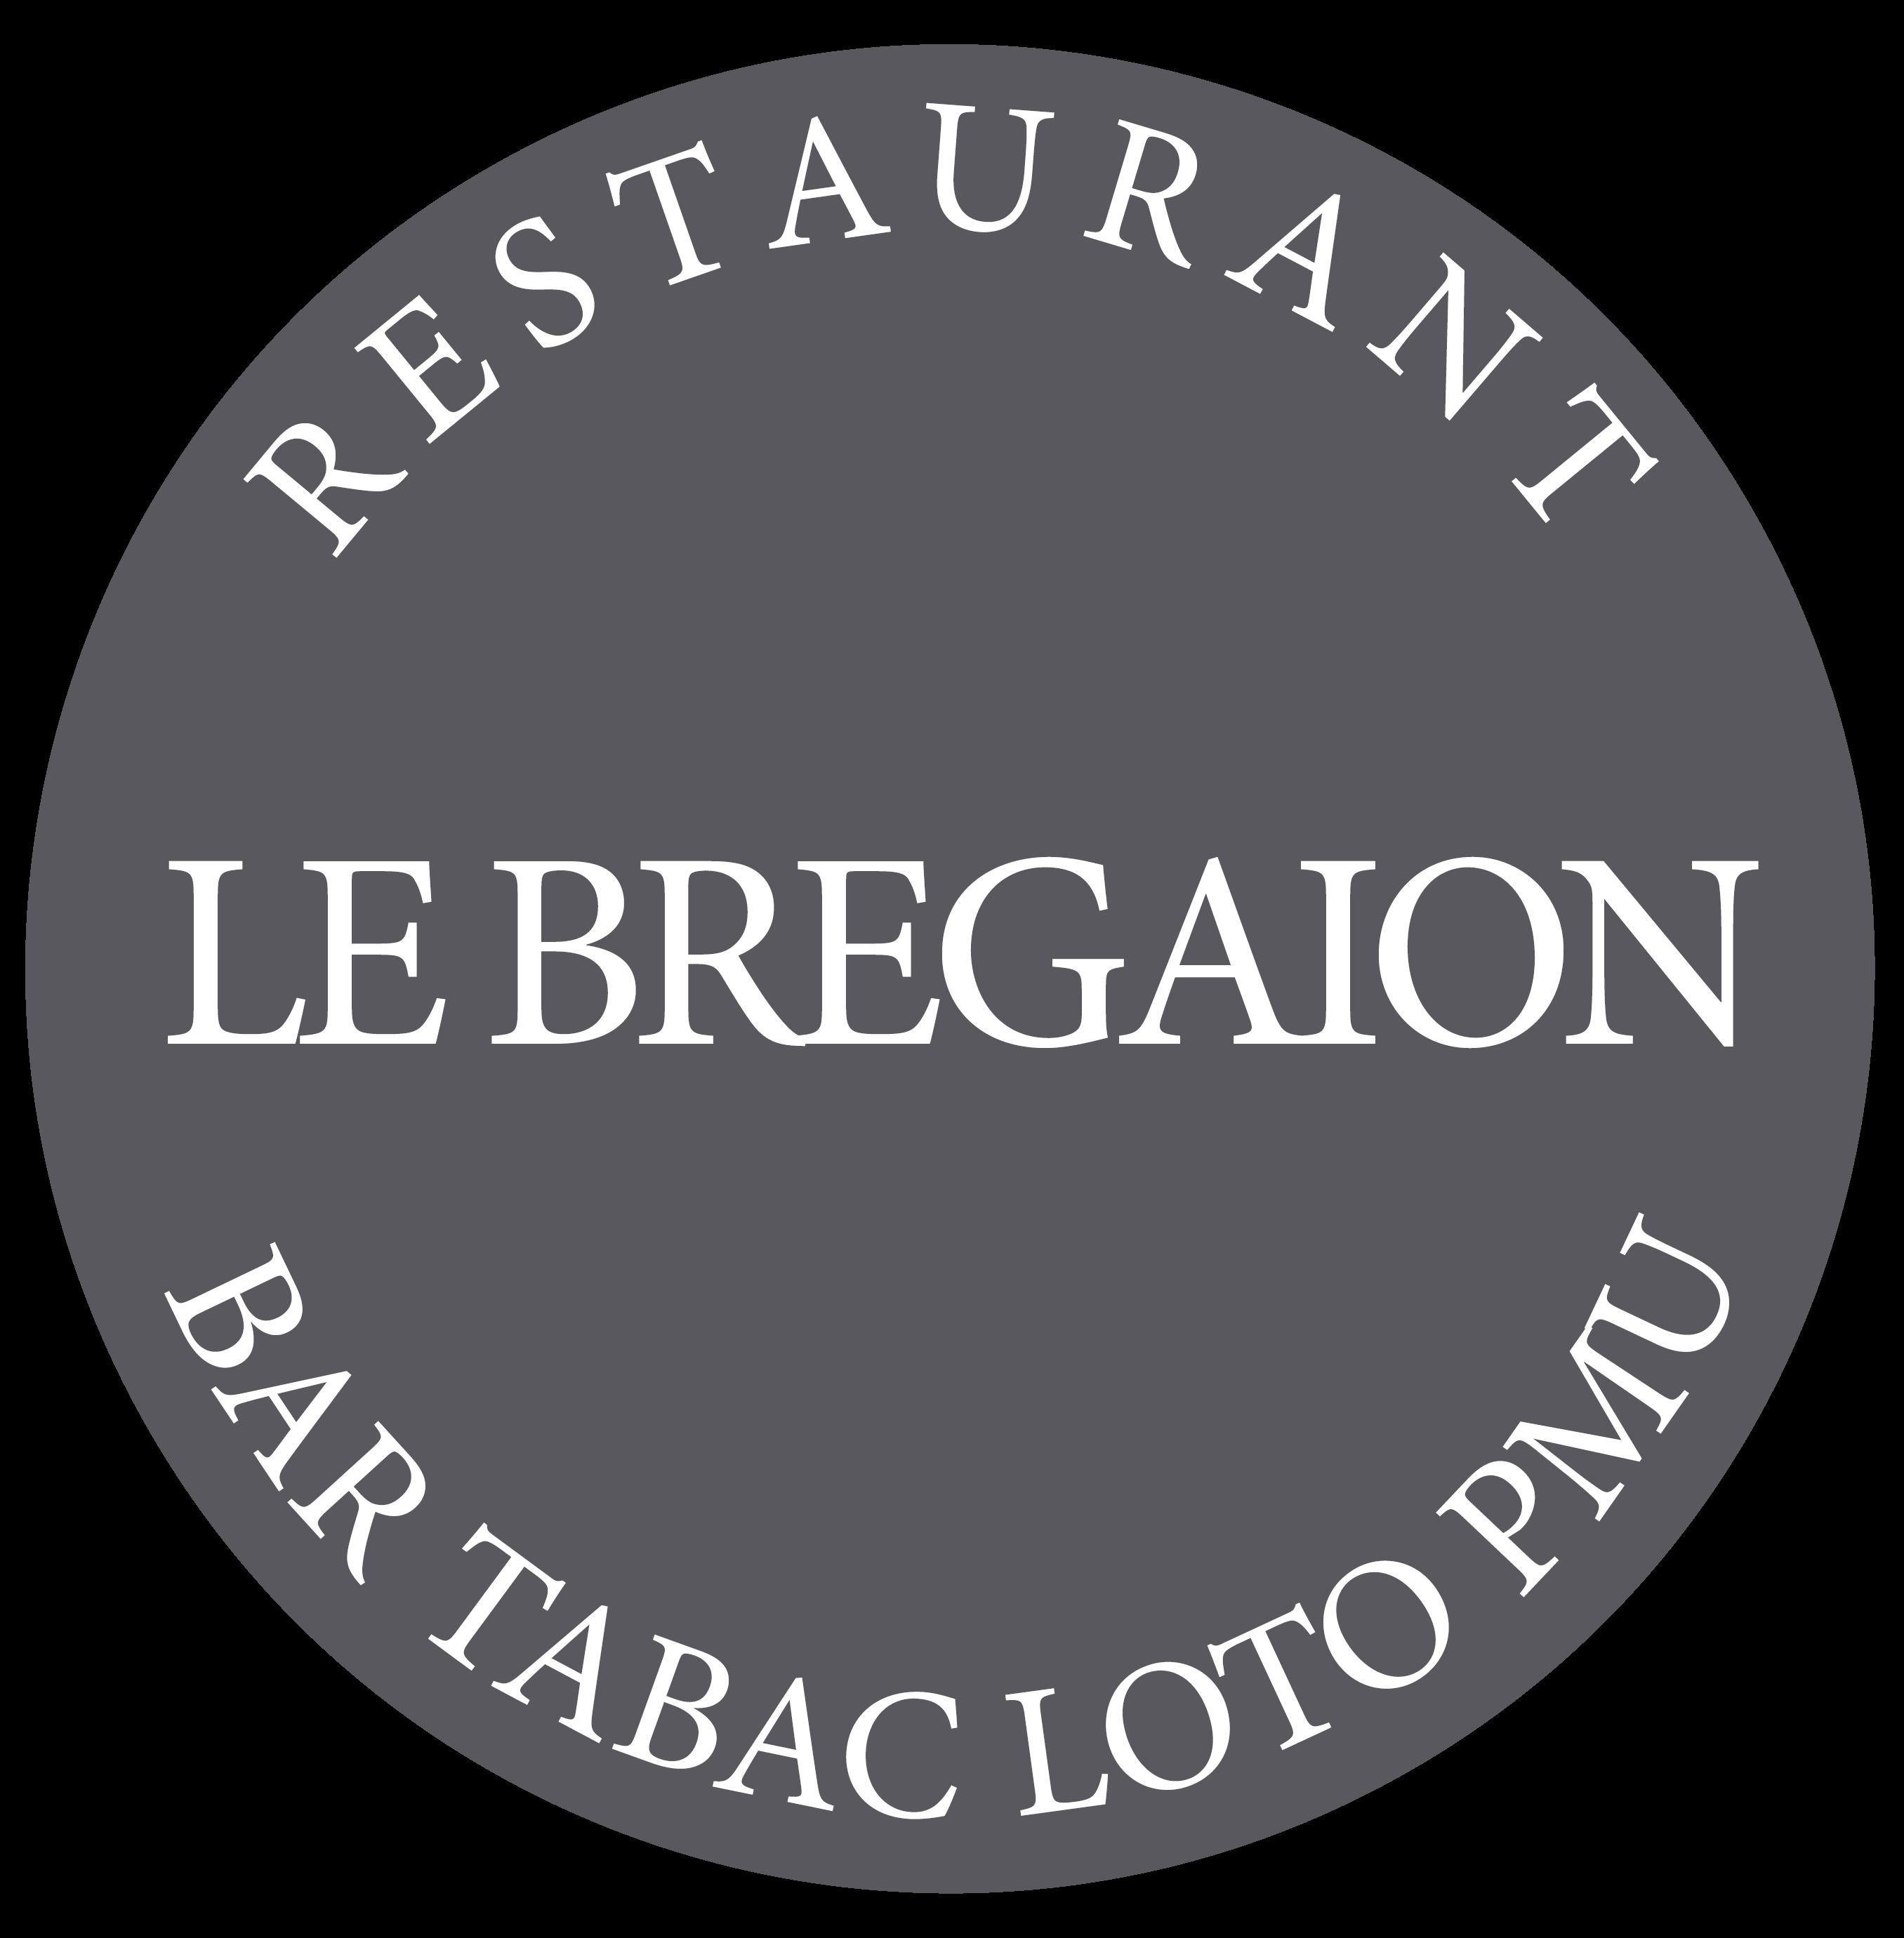 Le Bregaion